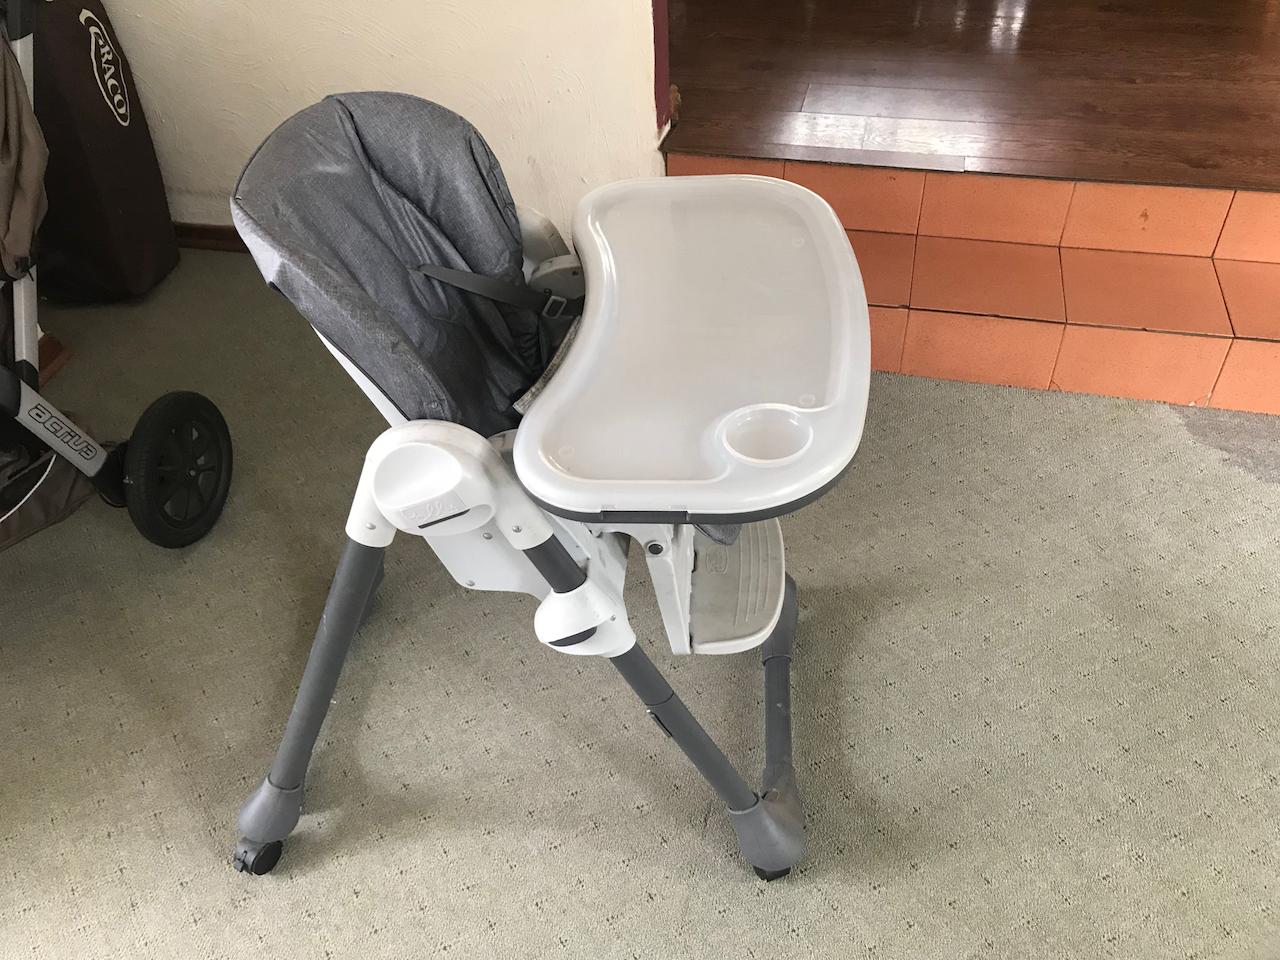 Chicco Polly High Chair & Chicco Polly High Chair | Junk Mail